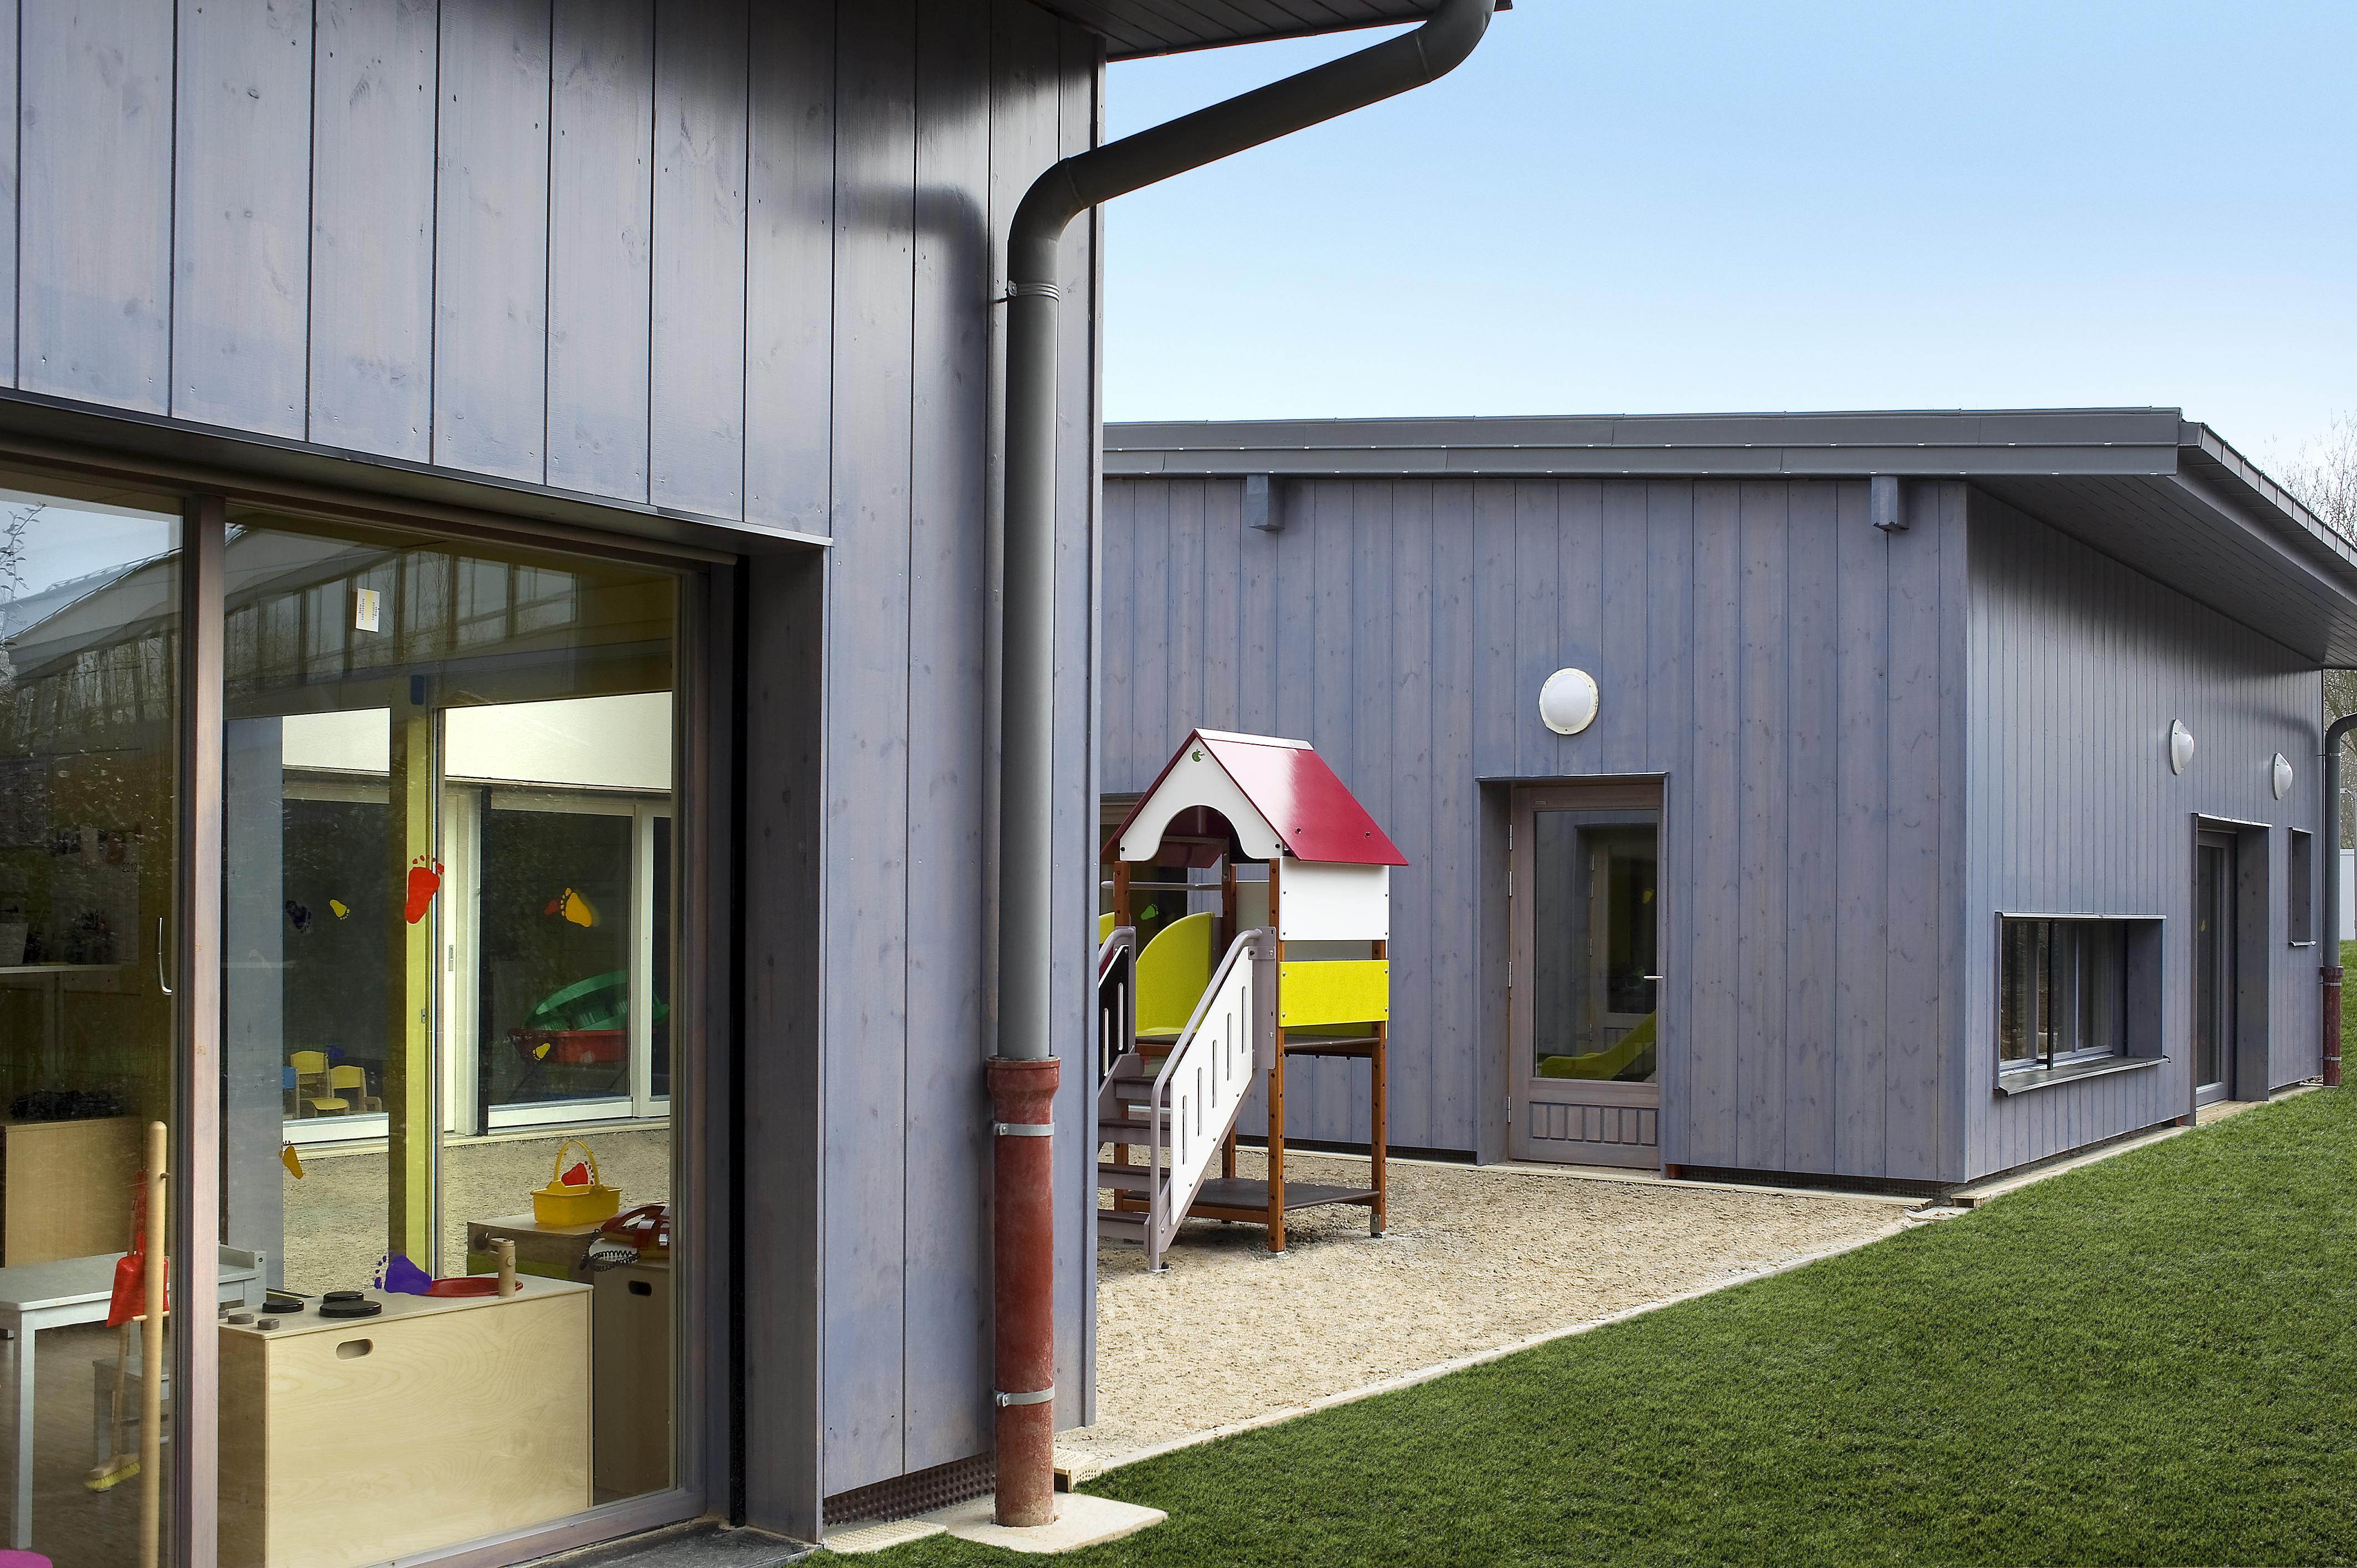 Детский сад и школа в городе Оулу